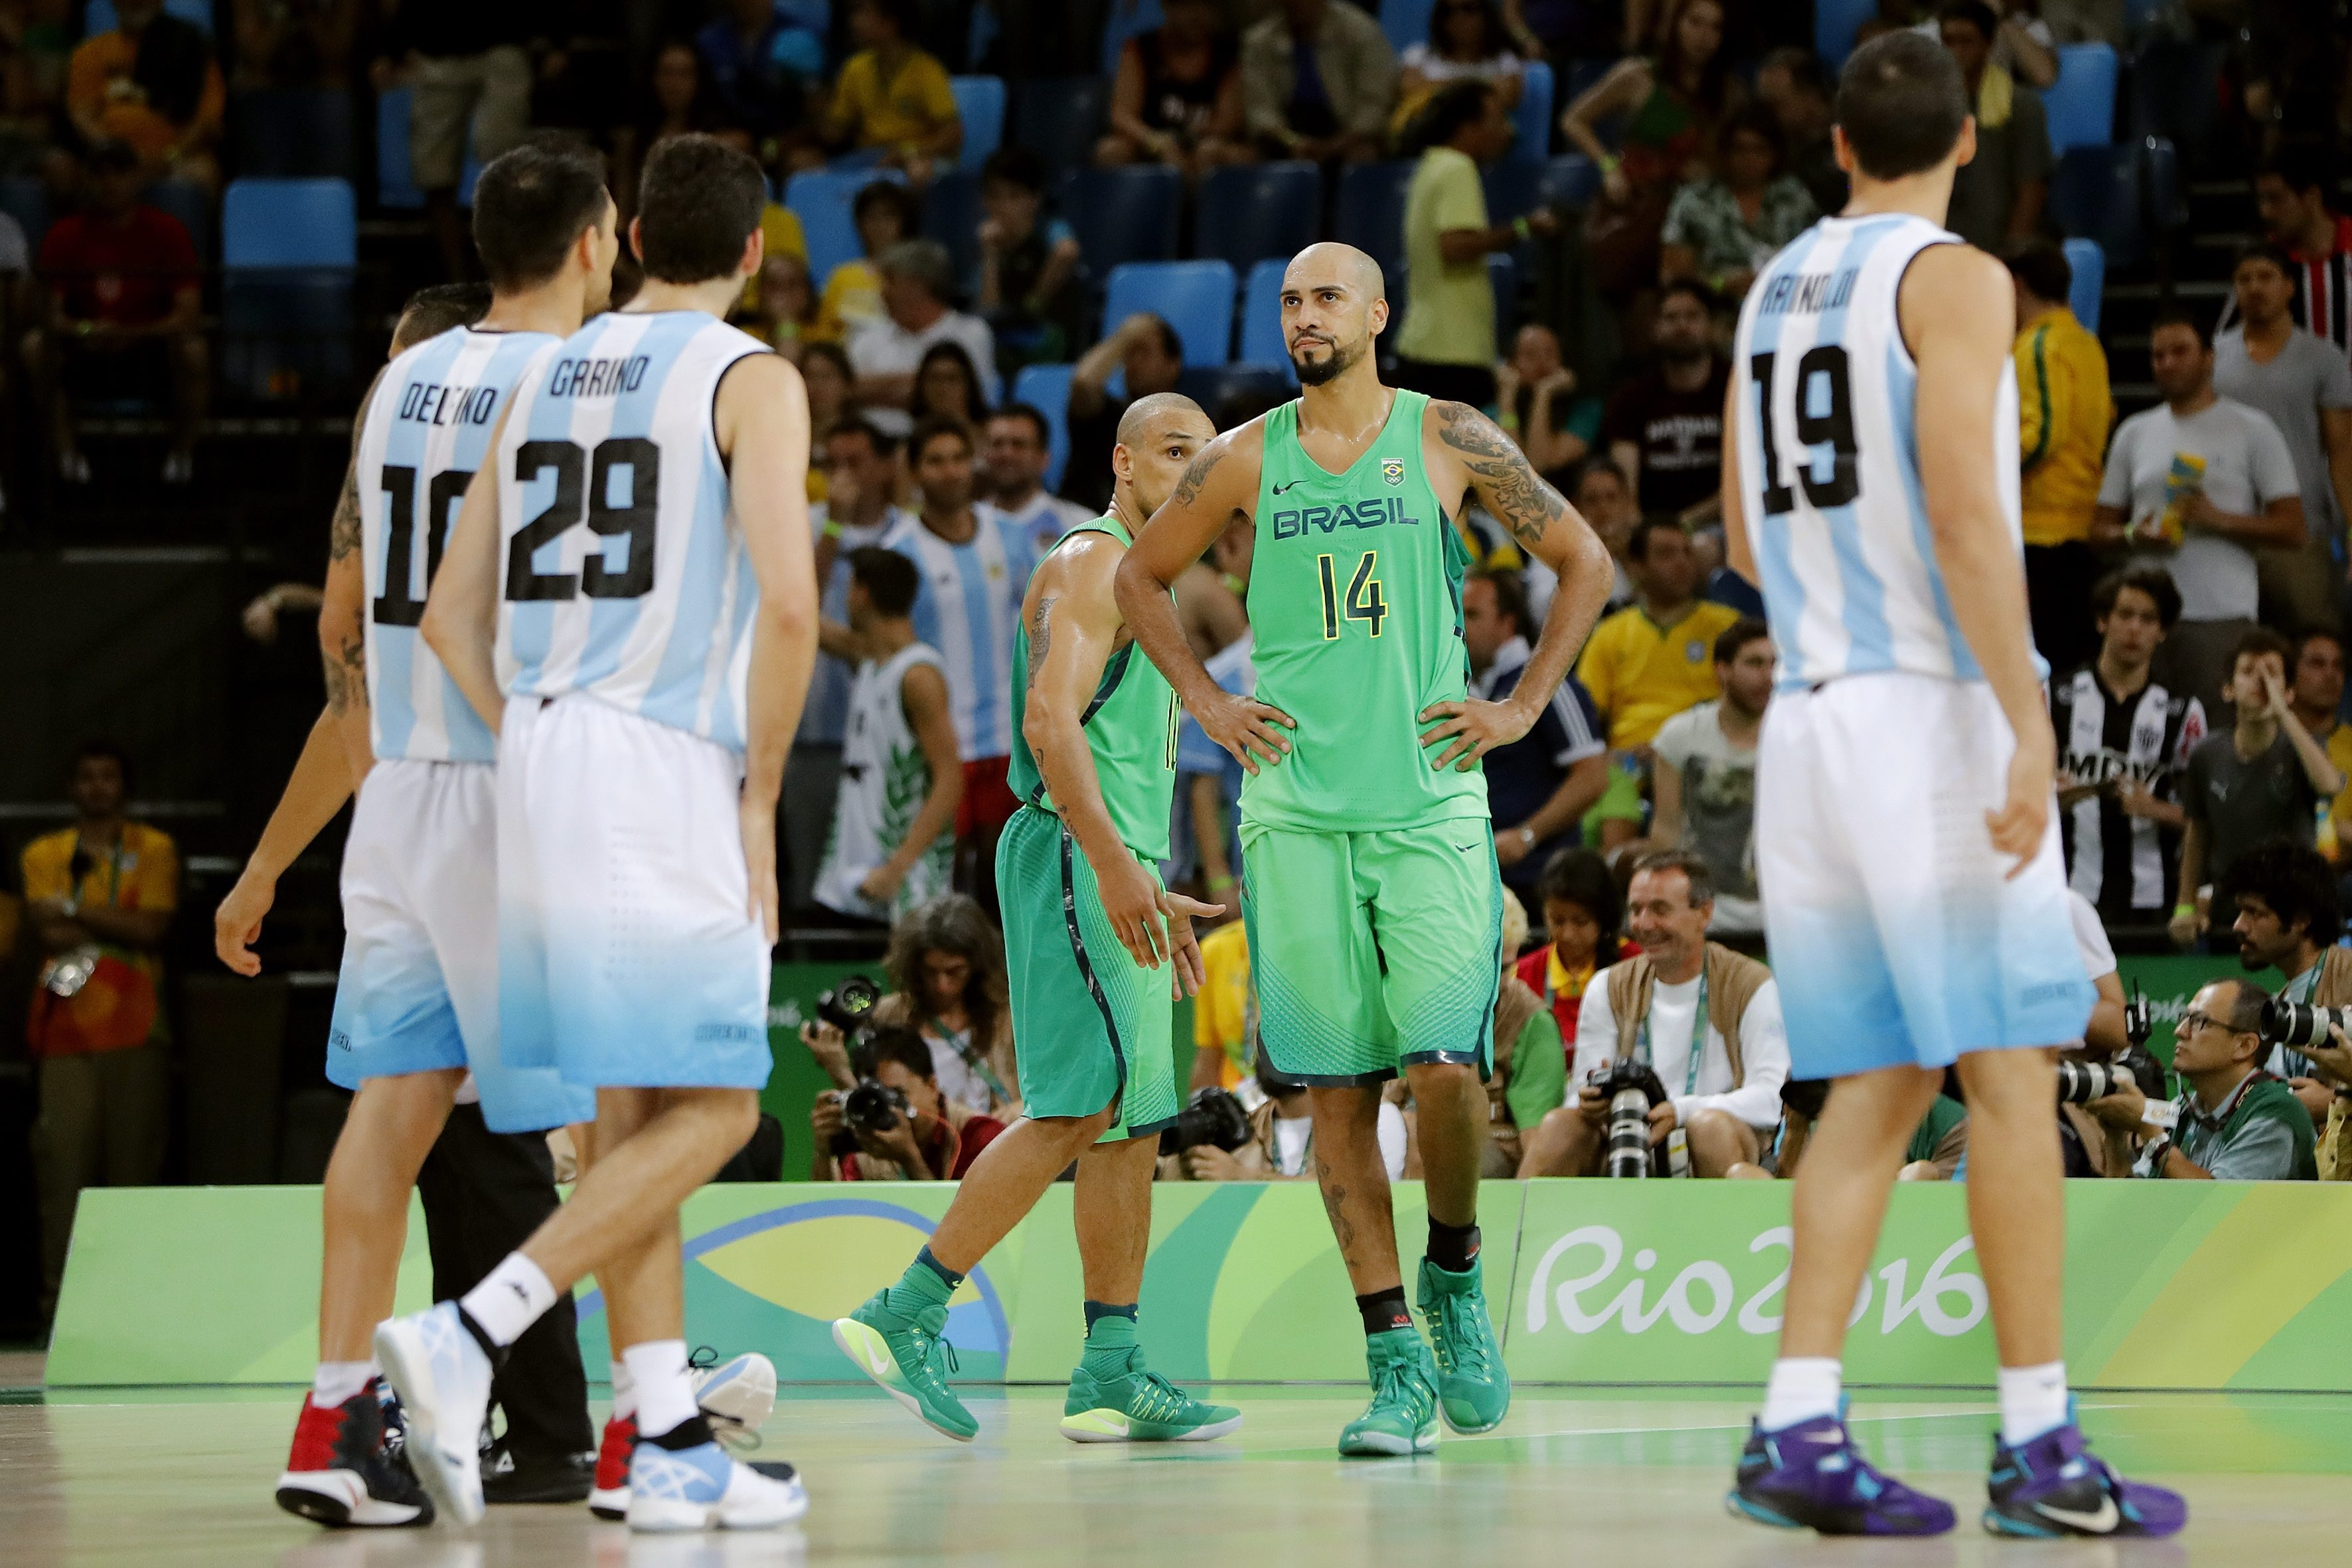 argentina_brasil_baloncesto_juegos_olimpicos_rio_2016_1349x594